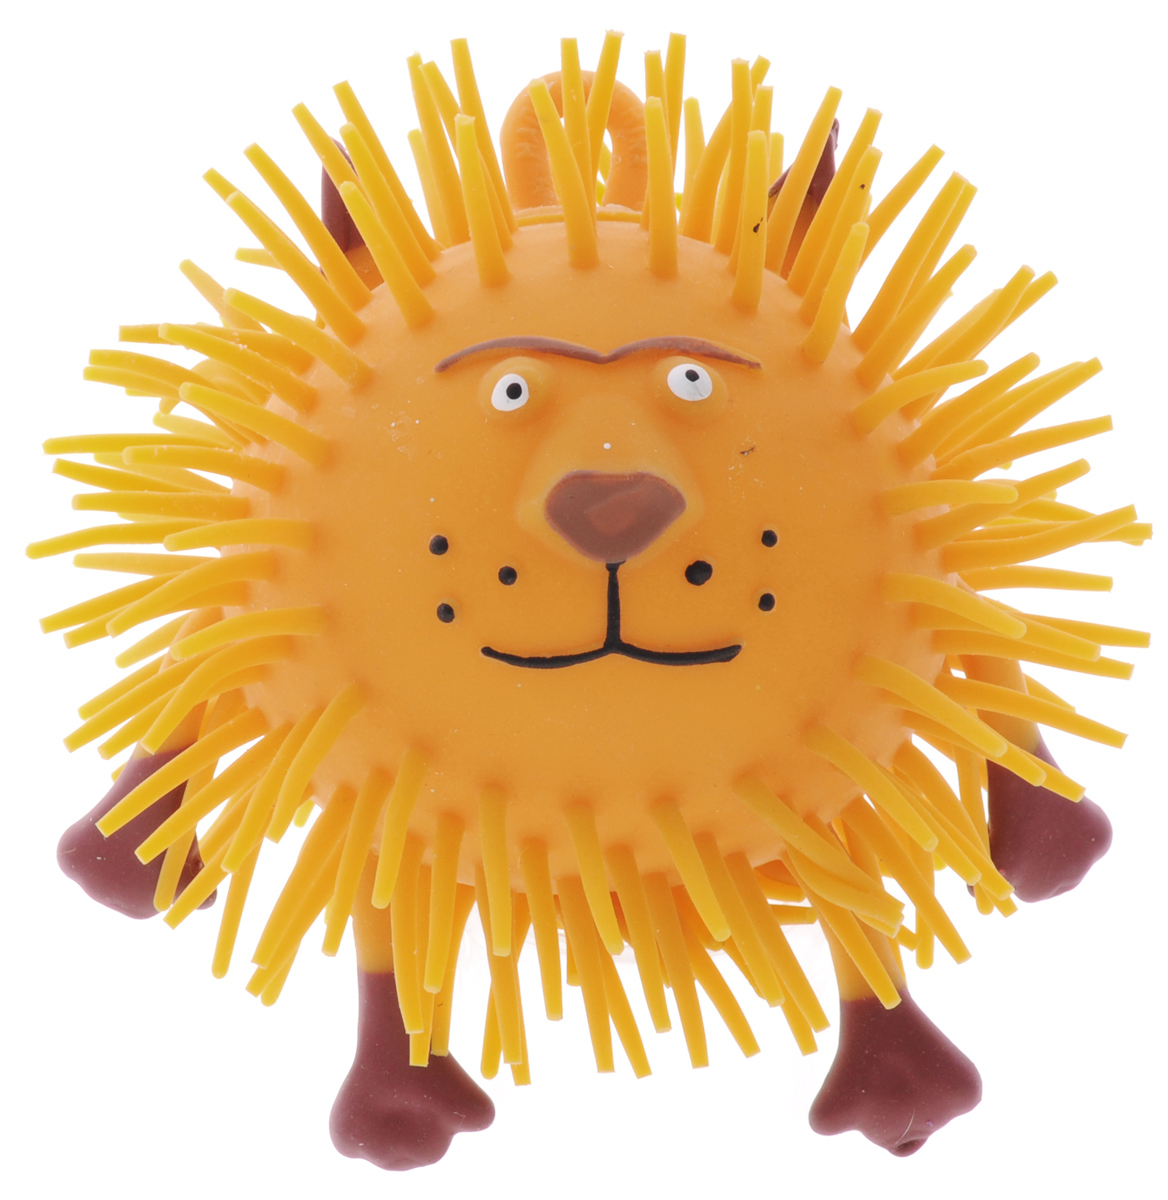 1TOY Игрушка-антистресс Ё-Ёжик Животное цвет оранжевый 1toy игрушка антистресс ё ёжик животное цвет розовый